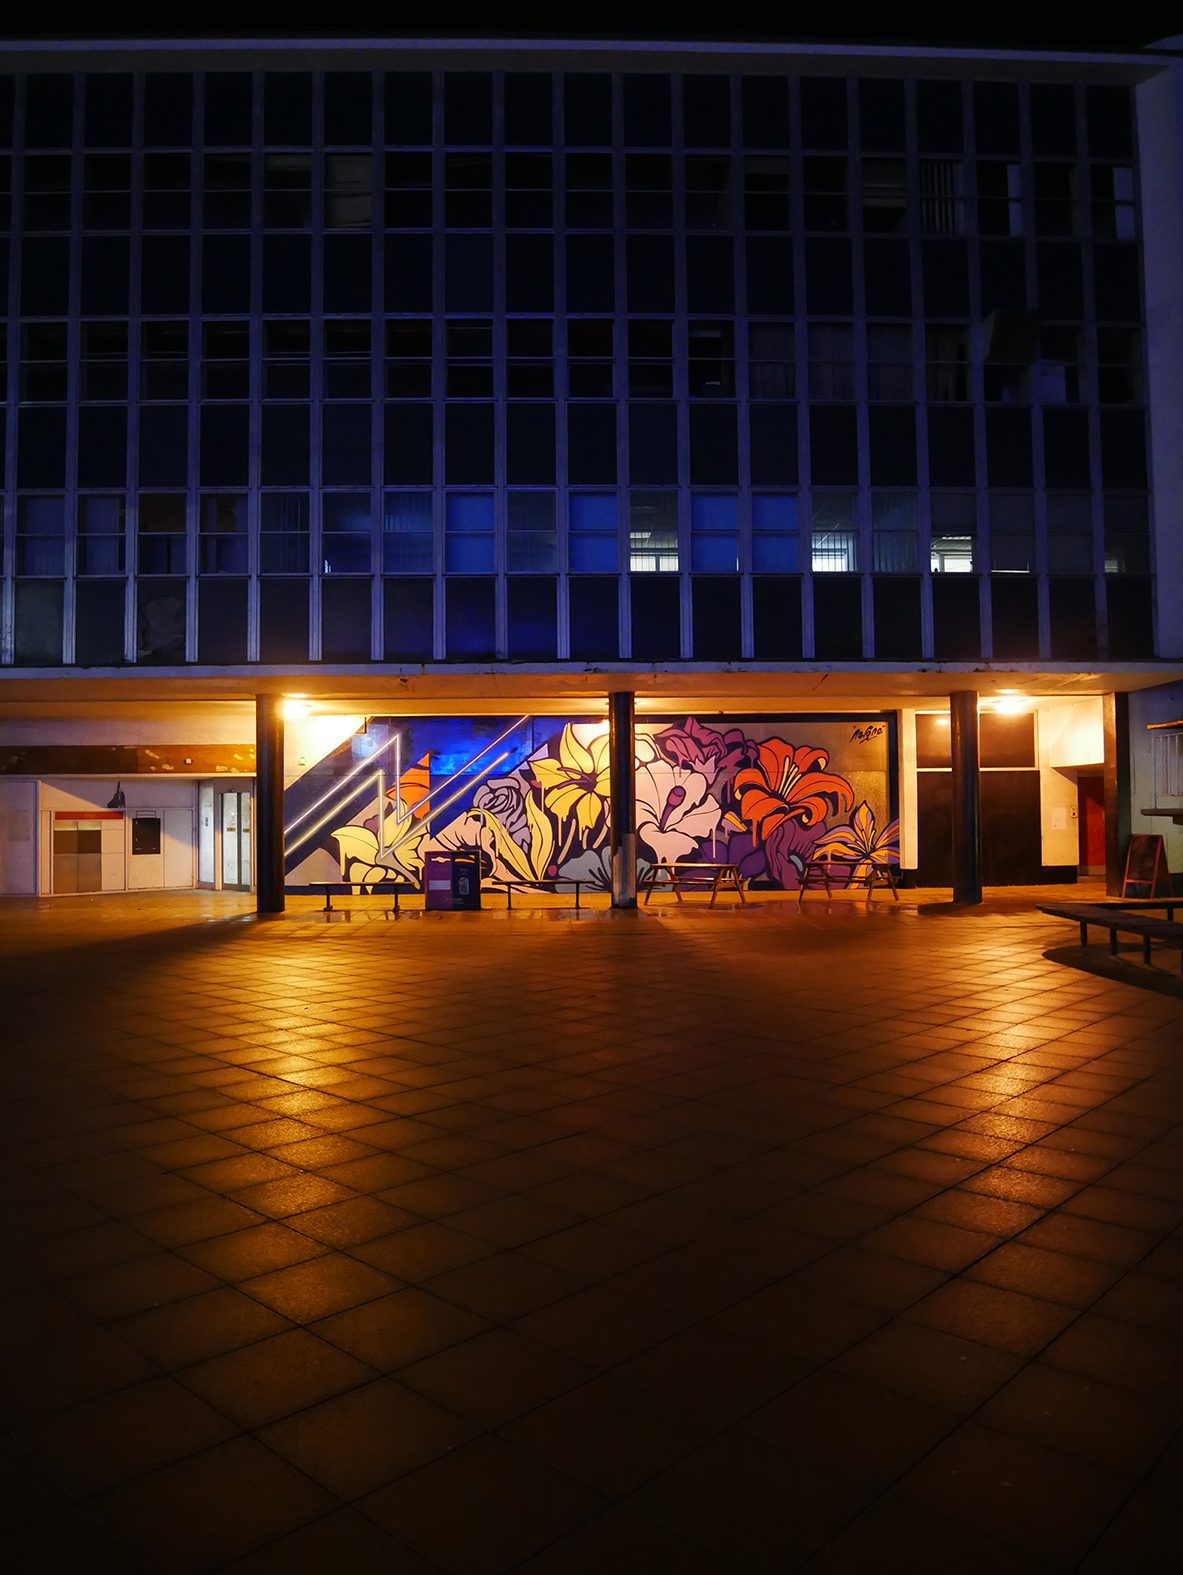 Nerone-street-art-Basildon-1